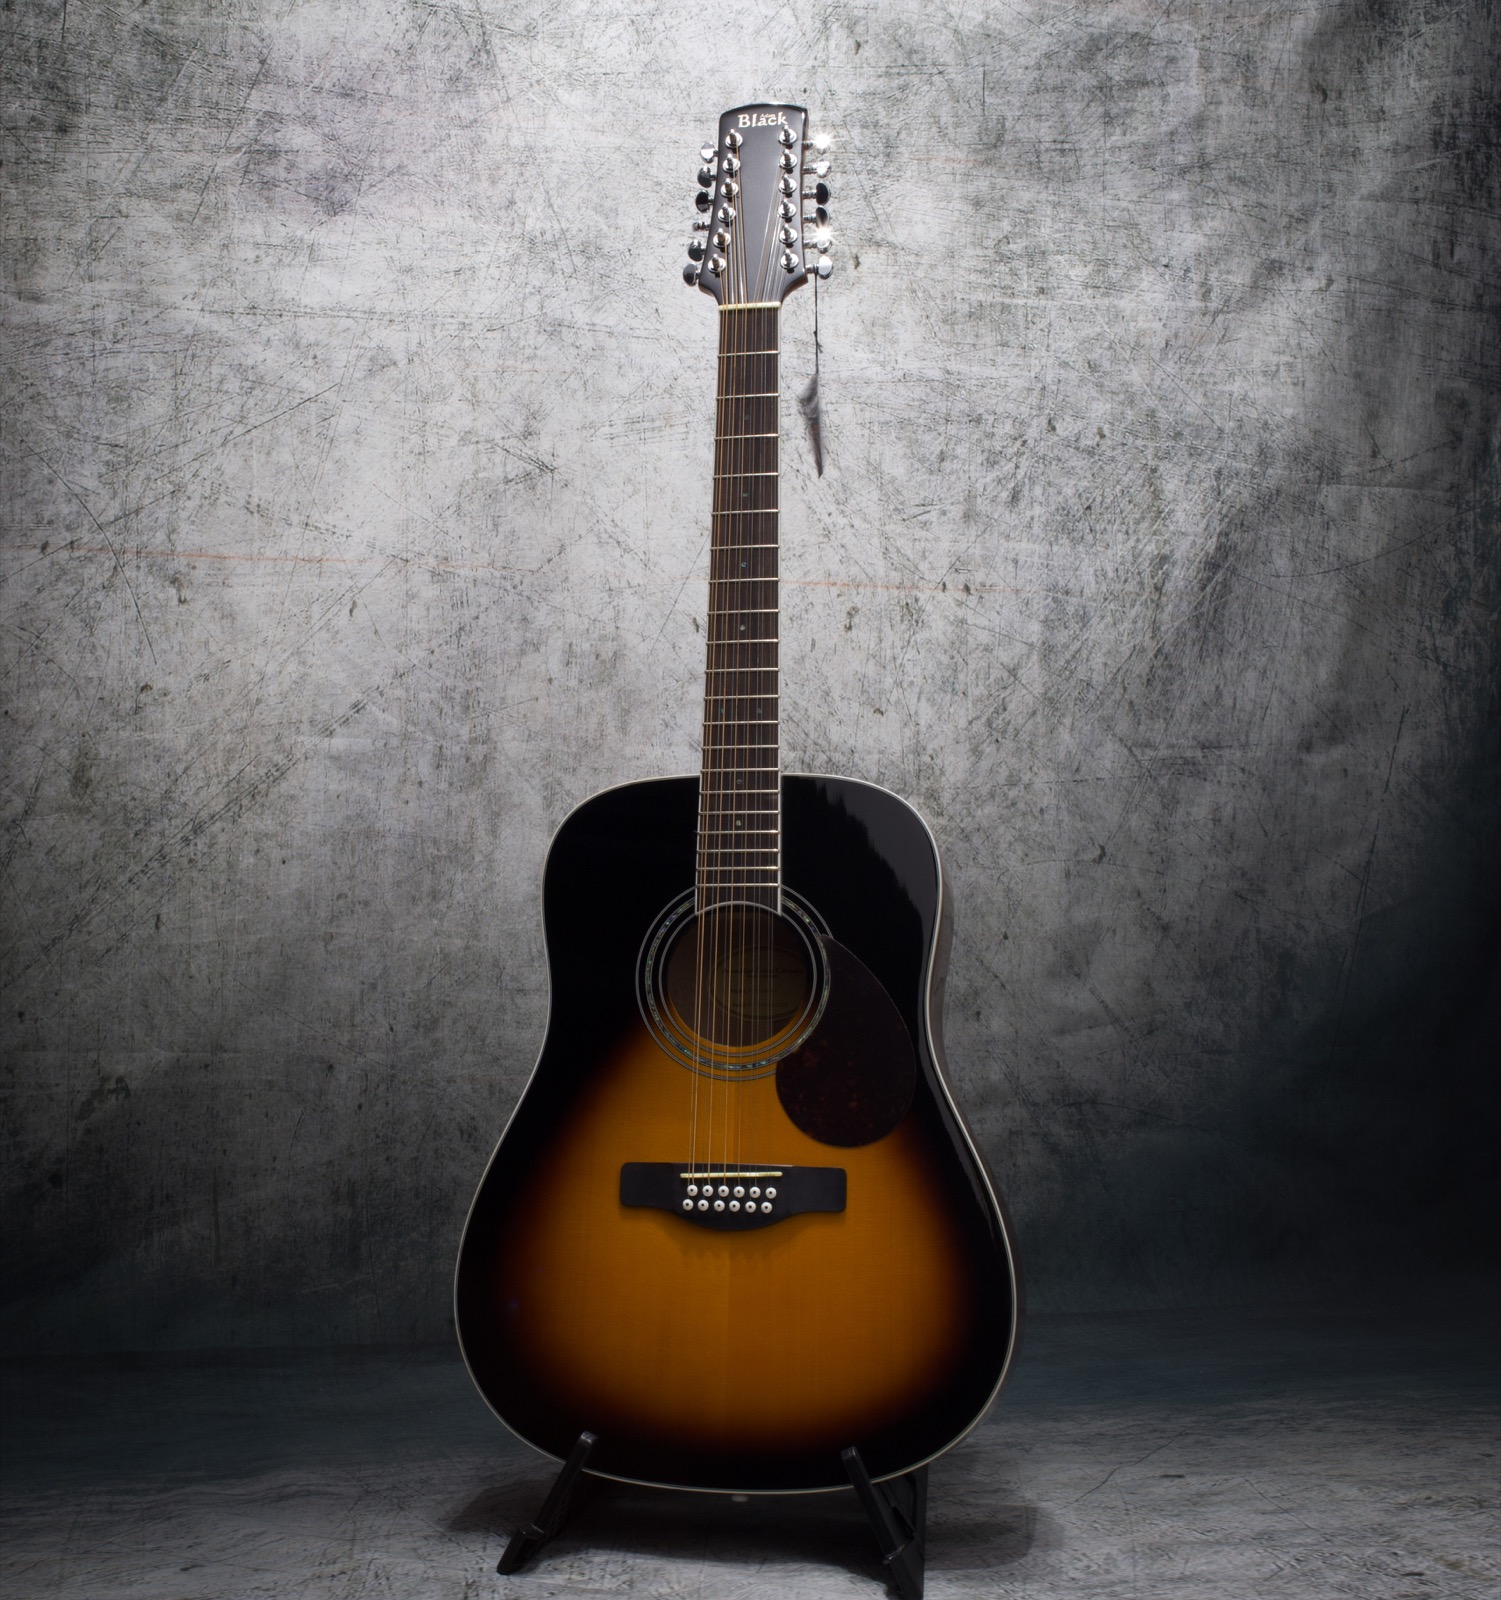 Adam Black 12 String Acoustic Guitar